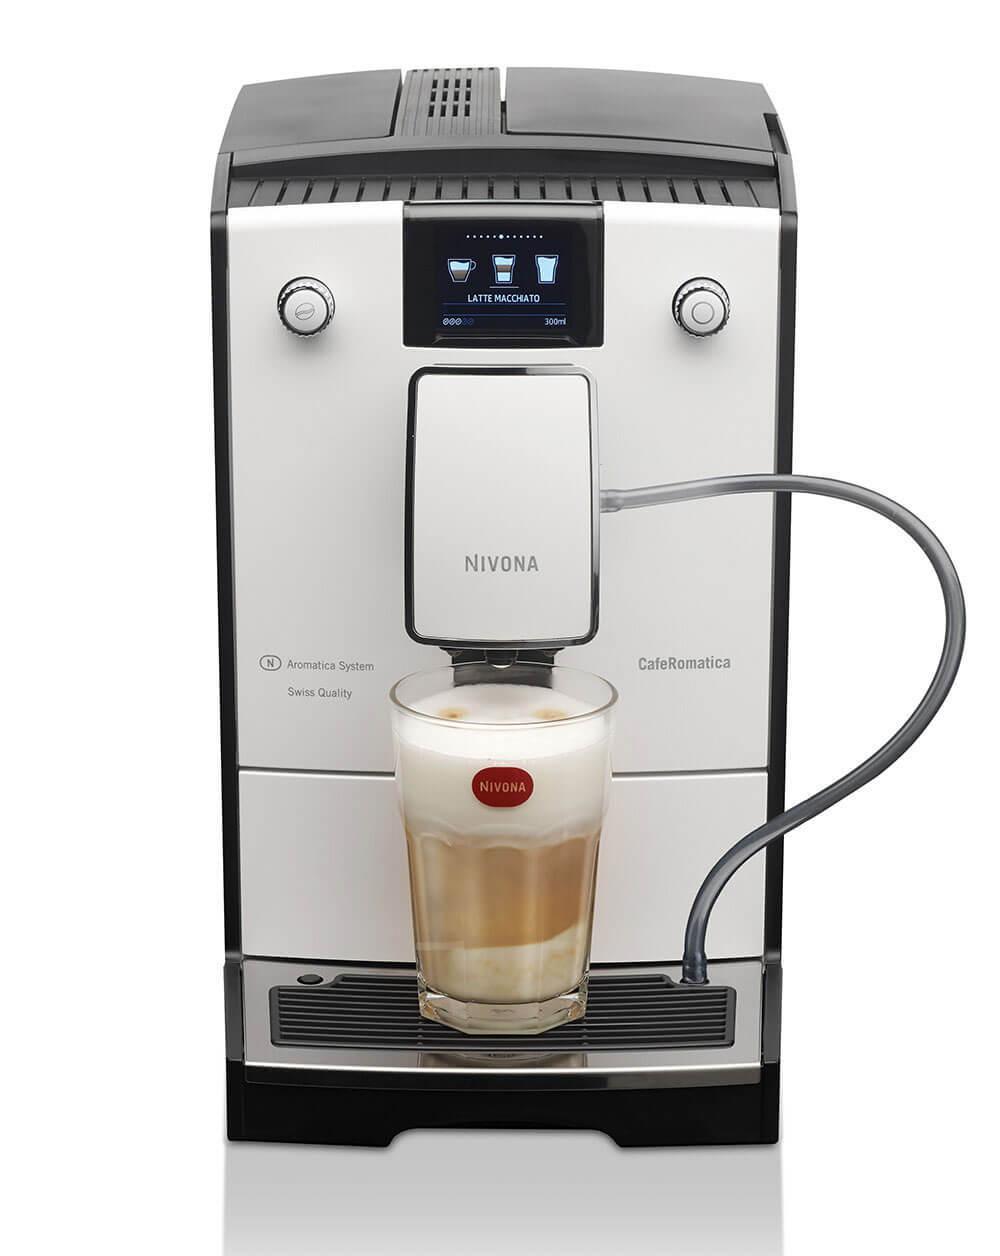 Nivona Kaffeevollautomat Cafe Romantica NICR 779 | Kamasega